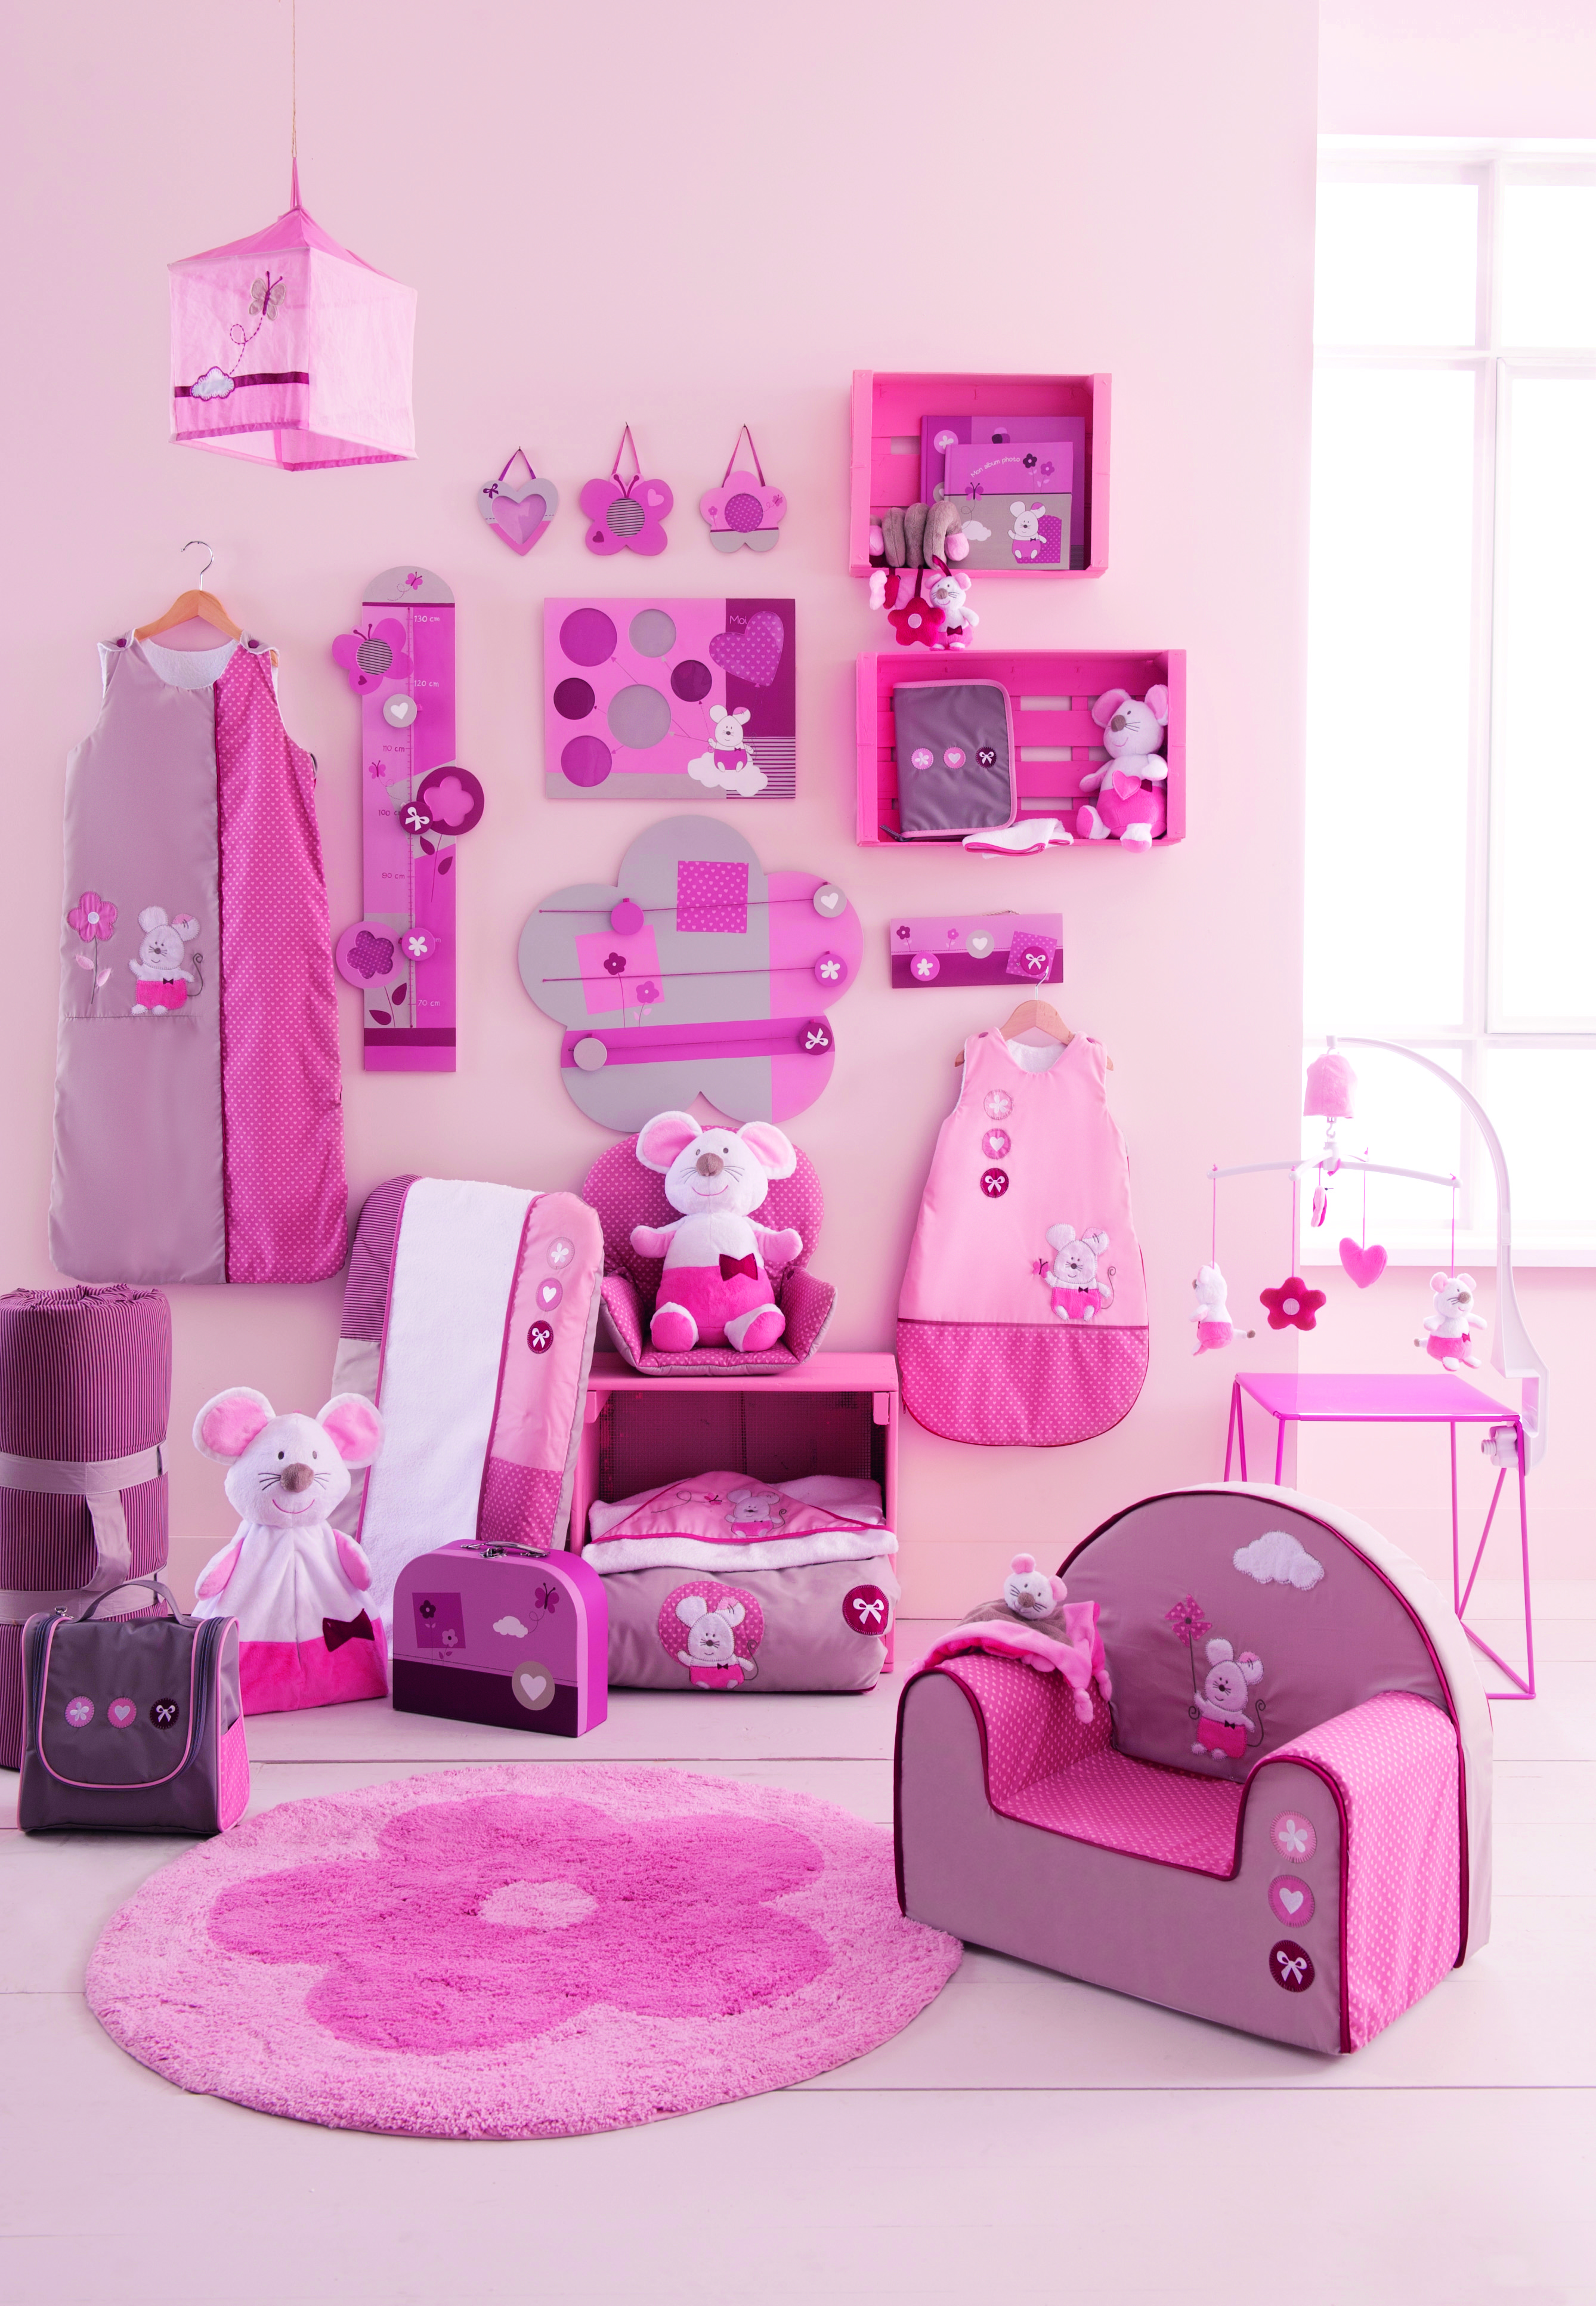 Je referai bien la chambre de mes filles avec b b 9 c for Tu me chambres